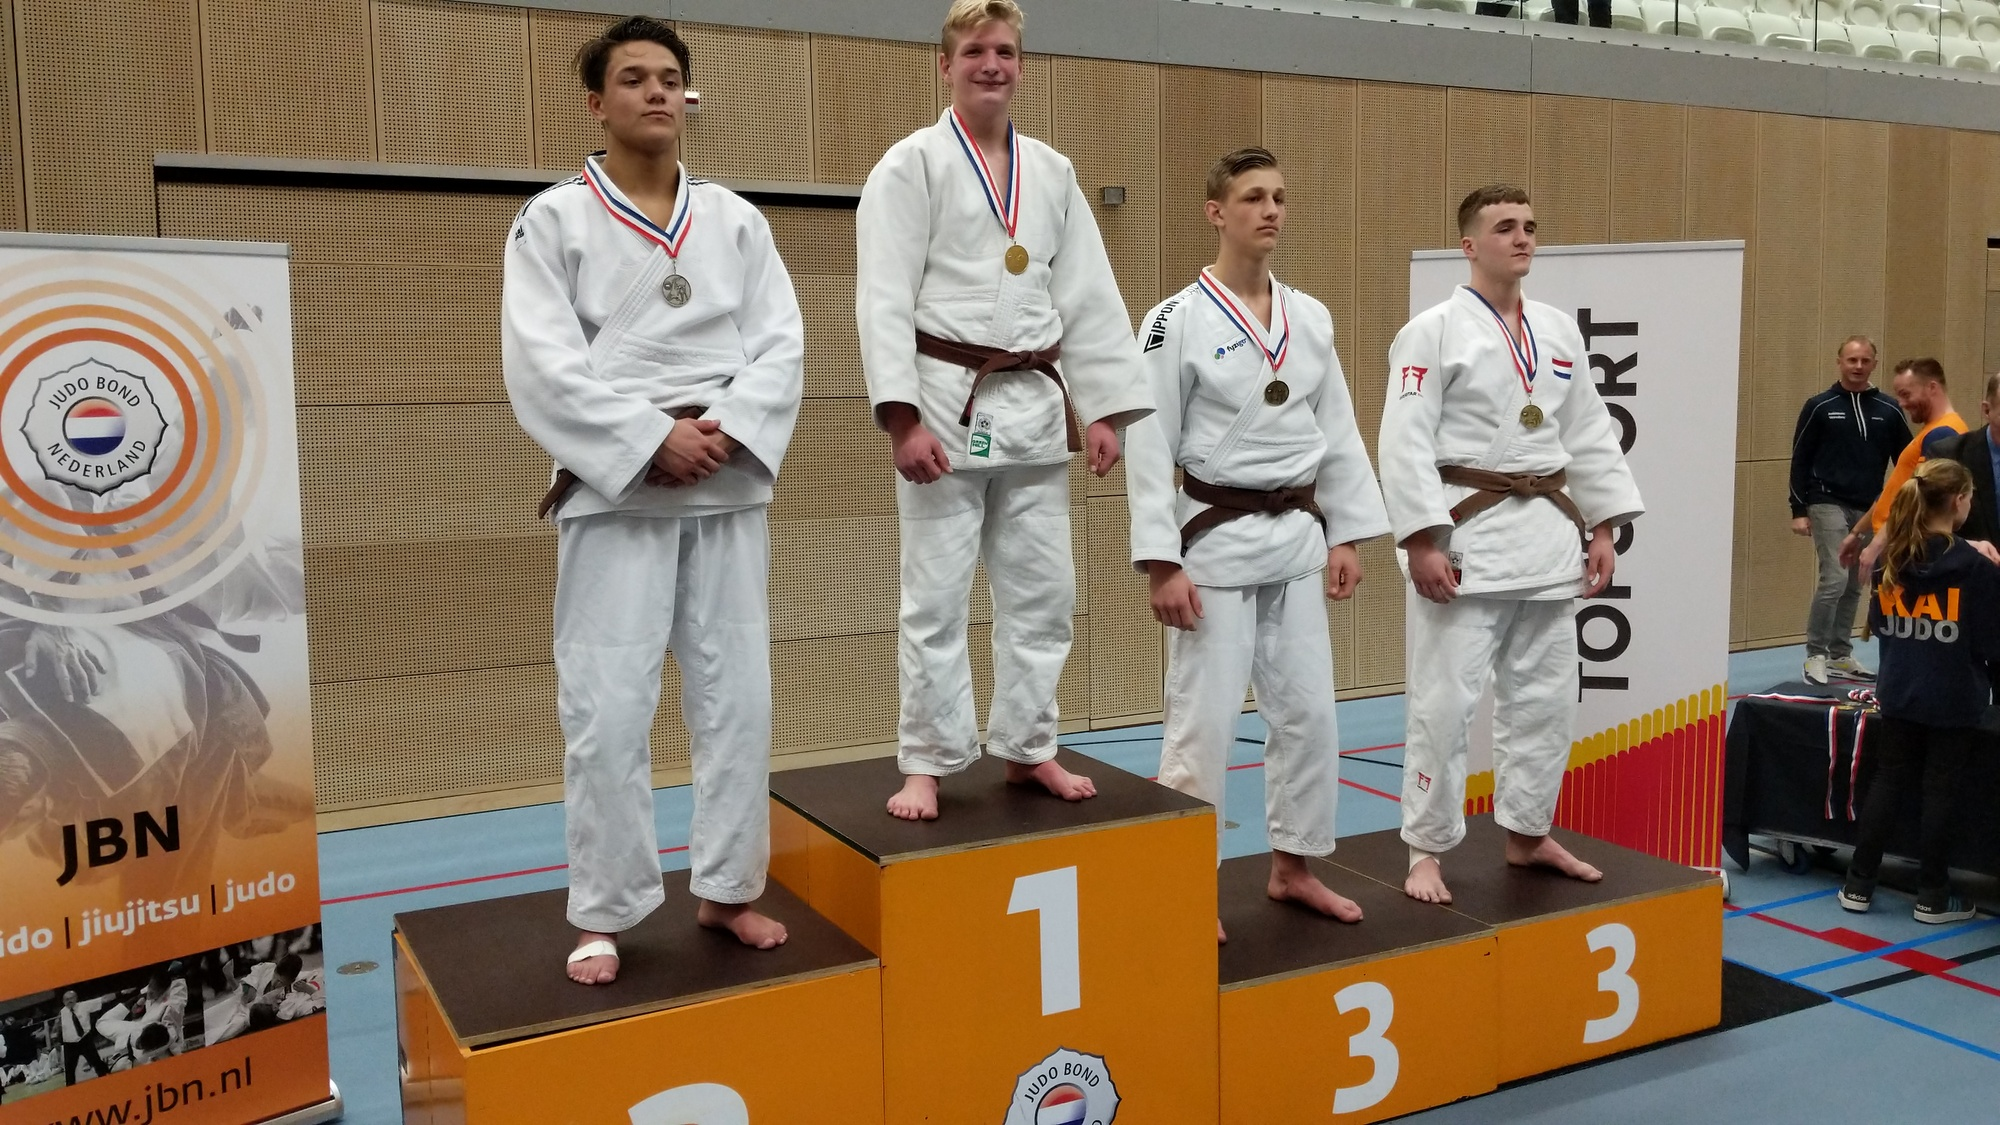 ba75e35a2ae Hessel Nicolai judo kampioen van Nederland - Tdiel NieuwsTdiel Nieuws